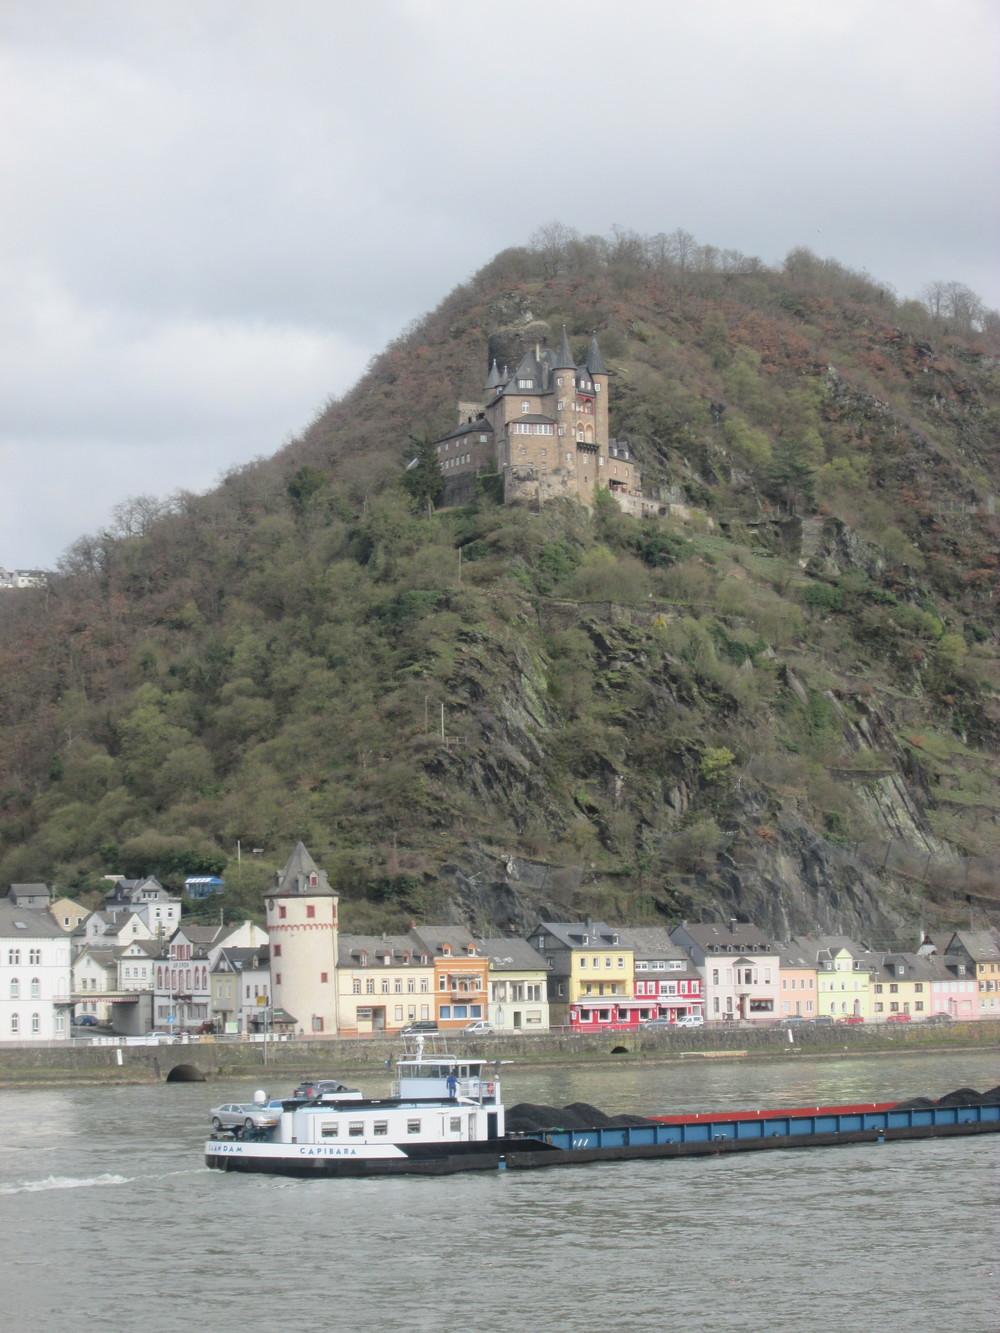 Burg Katz on the right bank of the Rhein, just a few kilometers upstream from Burg Maus.